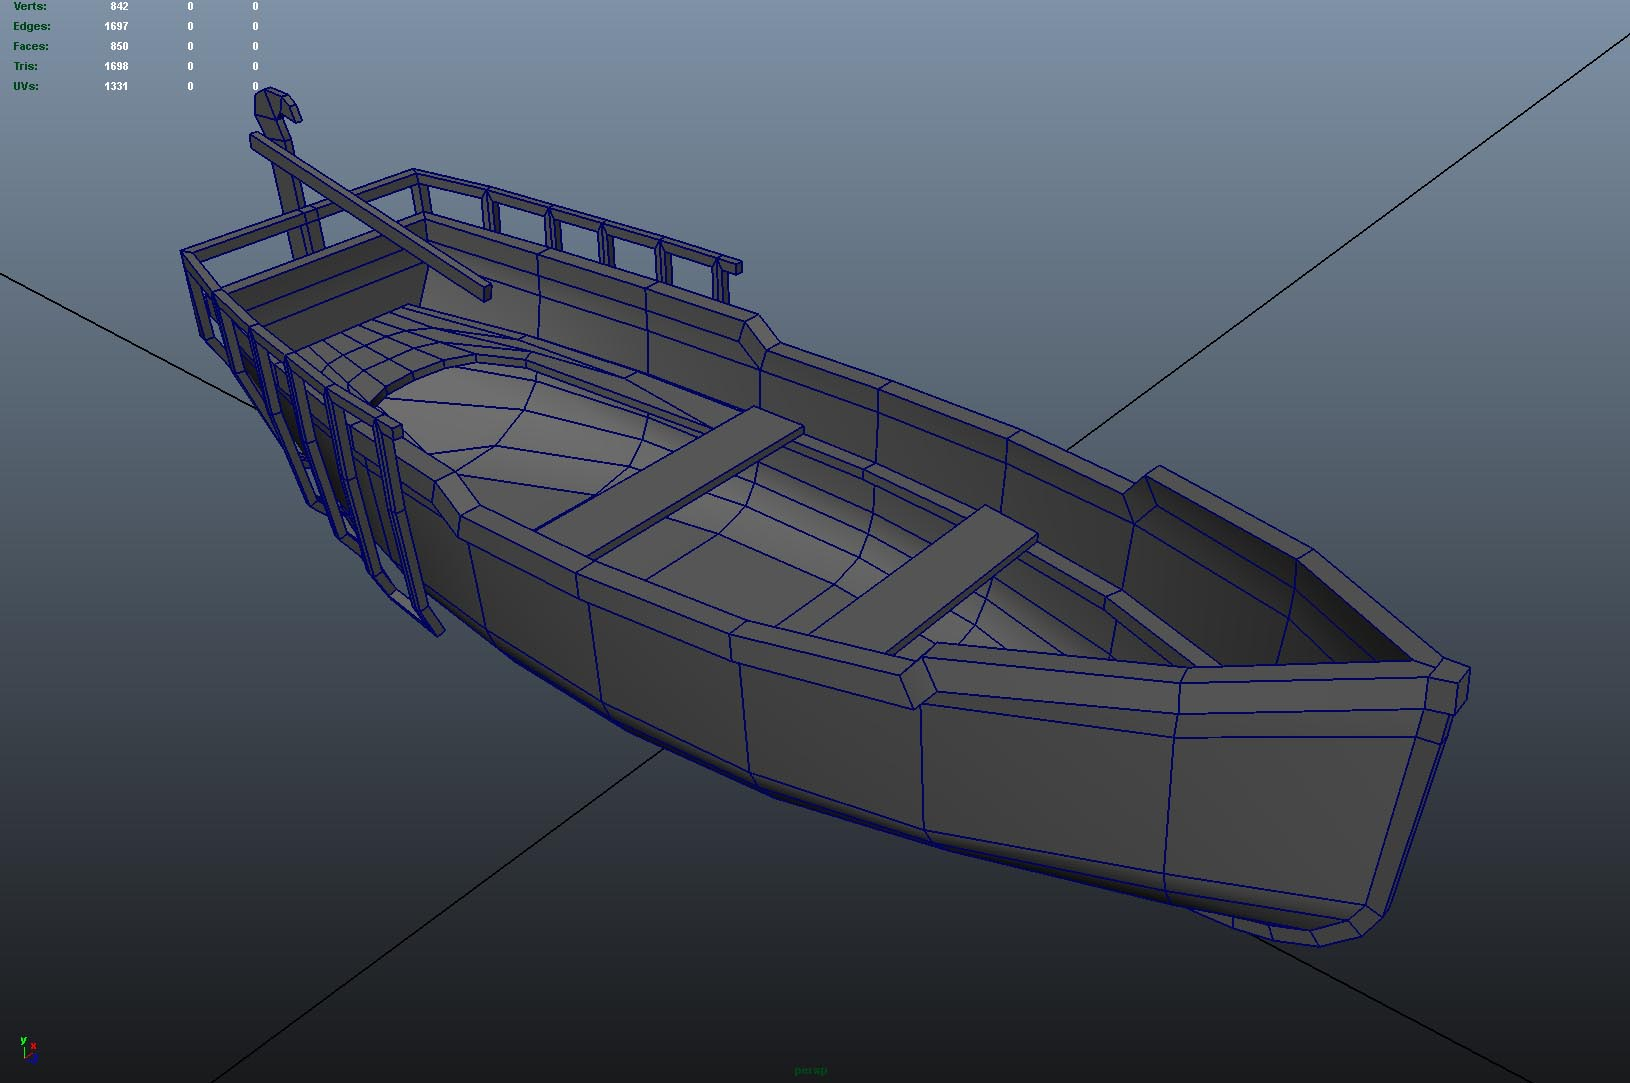 Pirate_Rowboat_Wireframe.jpg